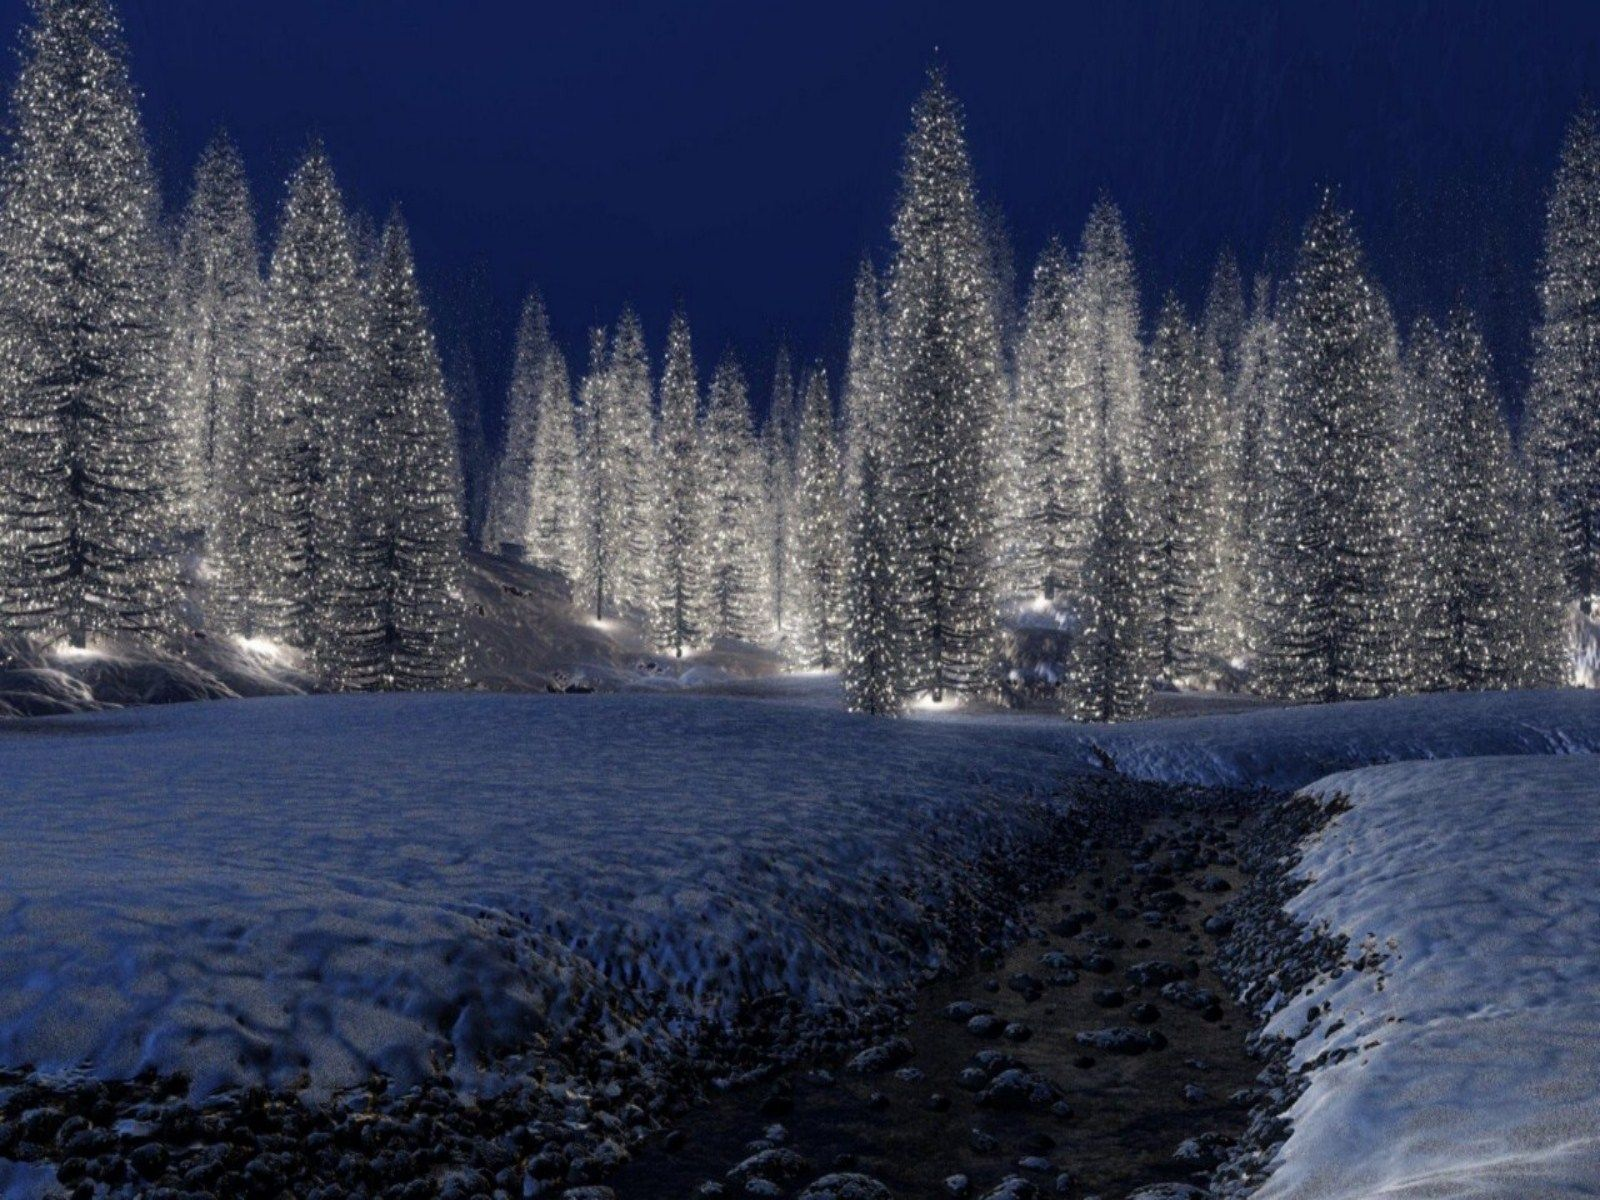 christmas scenery free download hd snowy christmas scene wallpaper